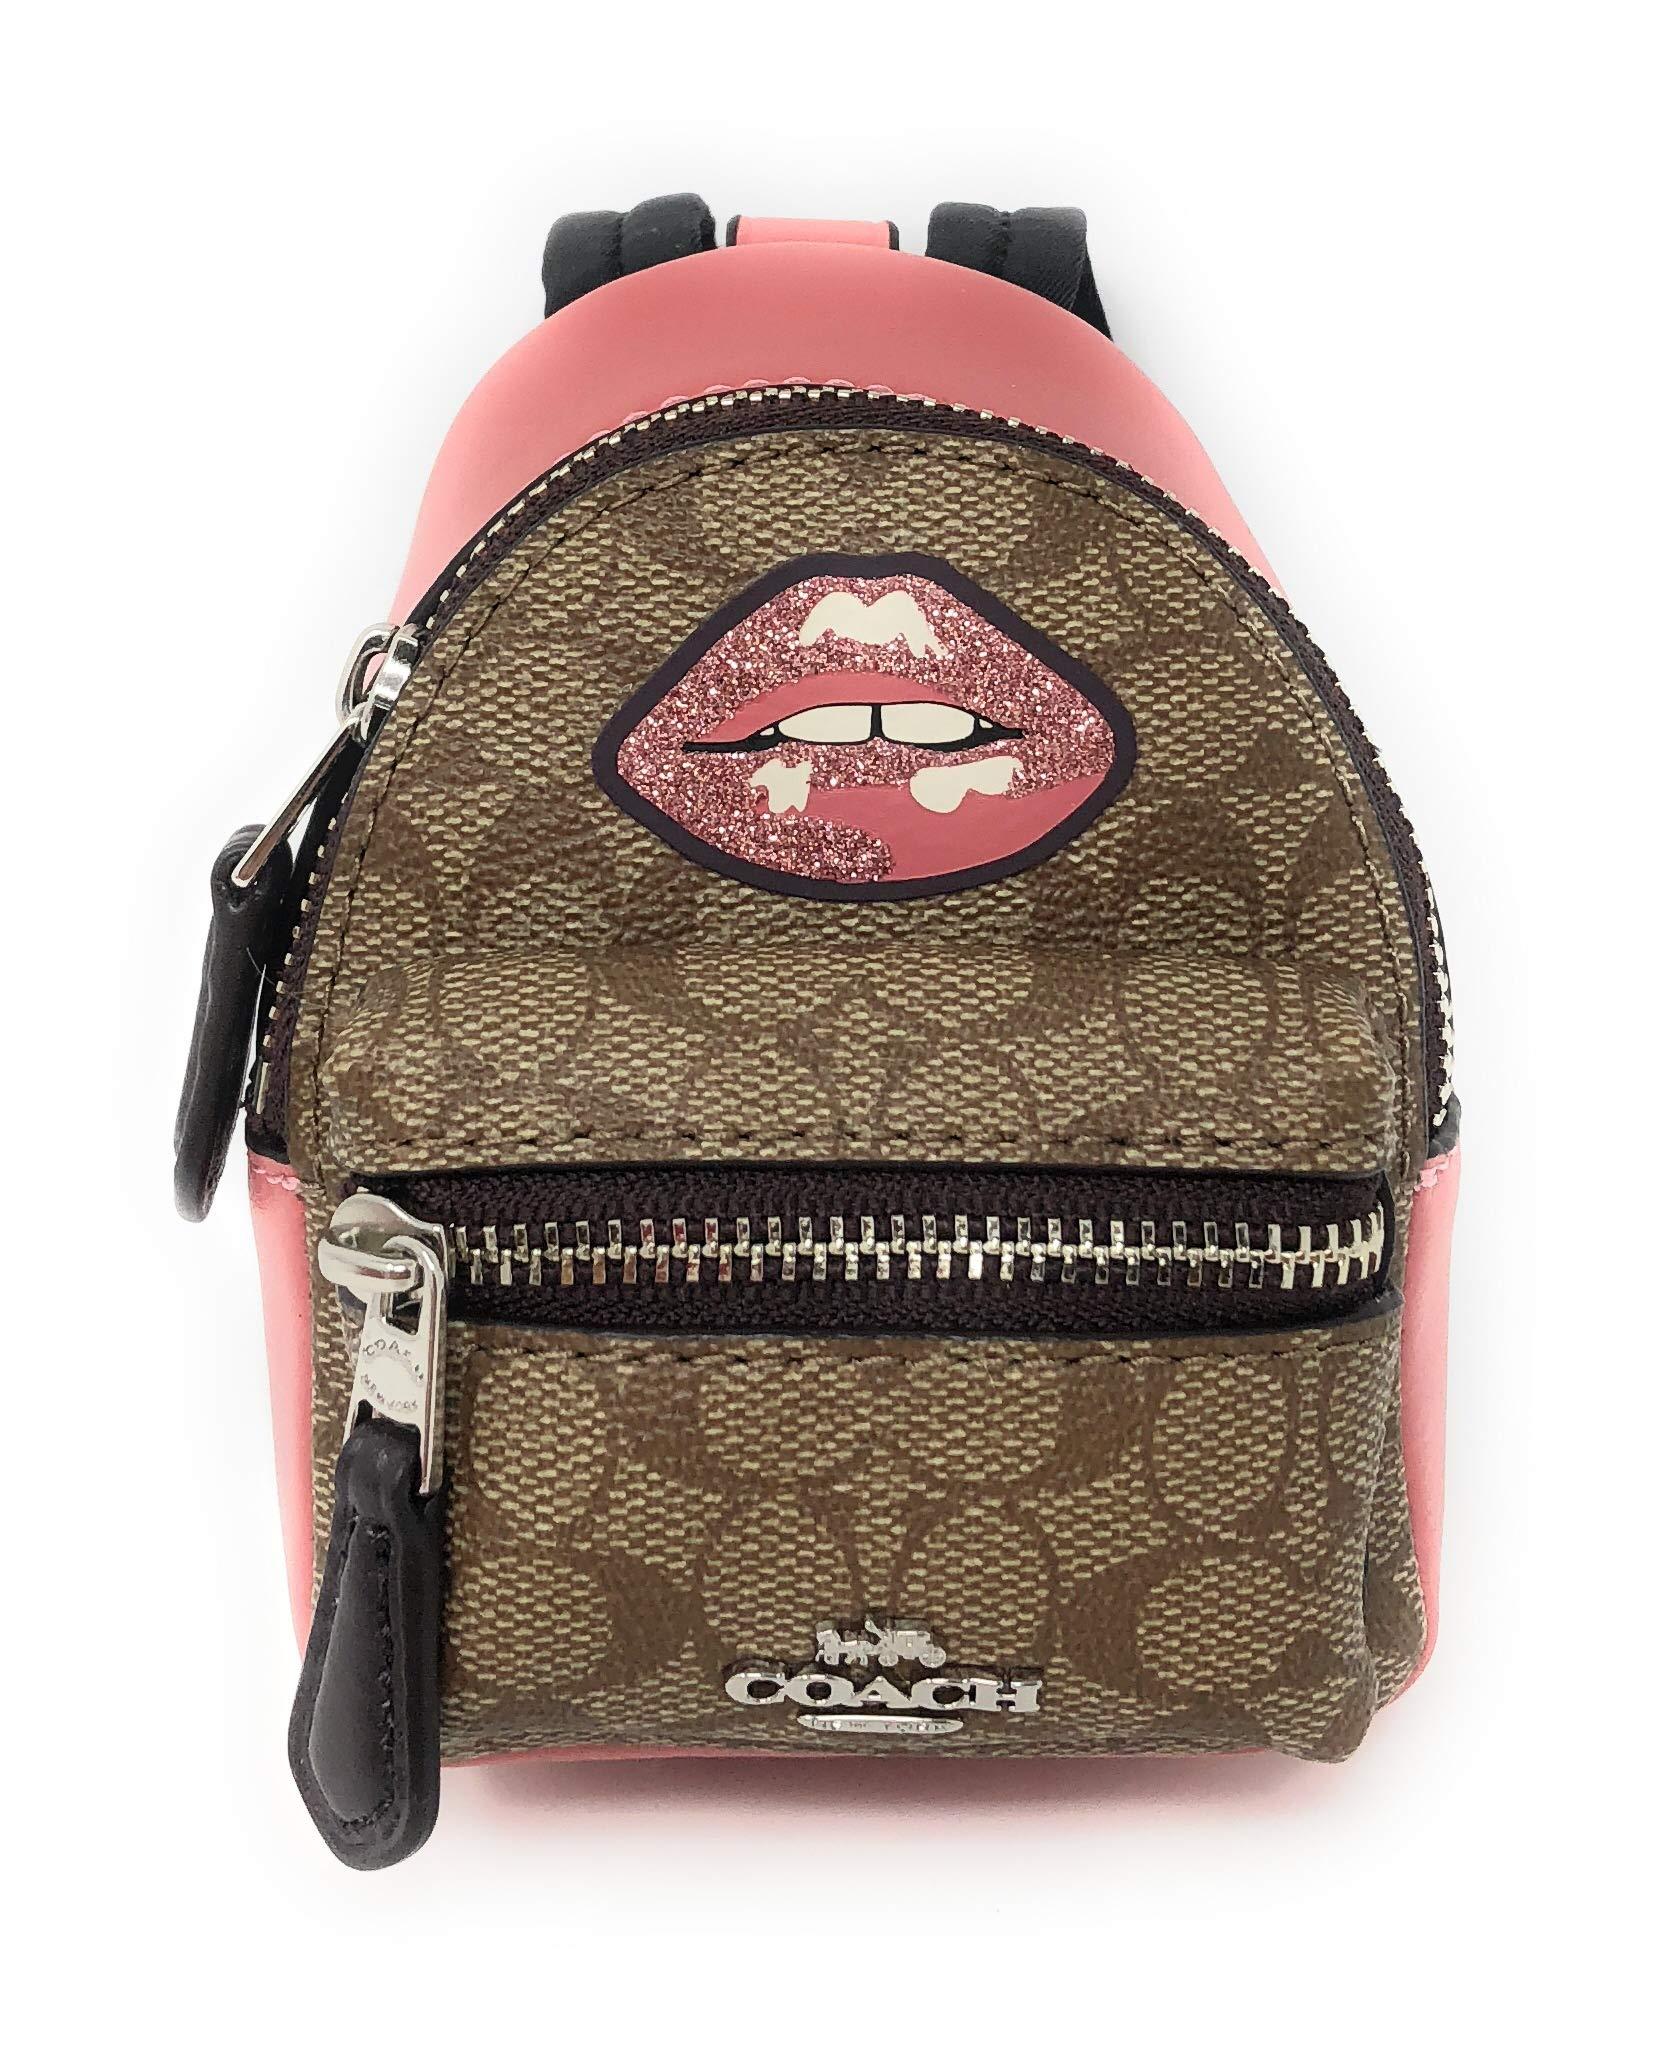 Coach Signature Backpack-Bag Coin Case Charm Key Chain